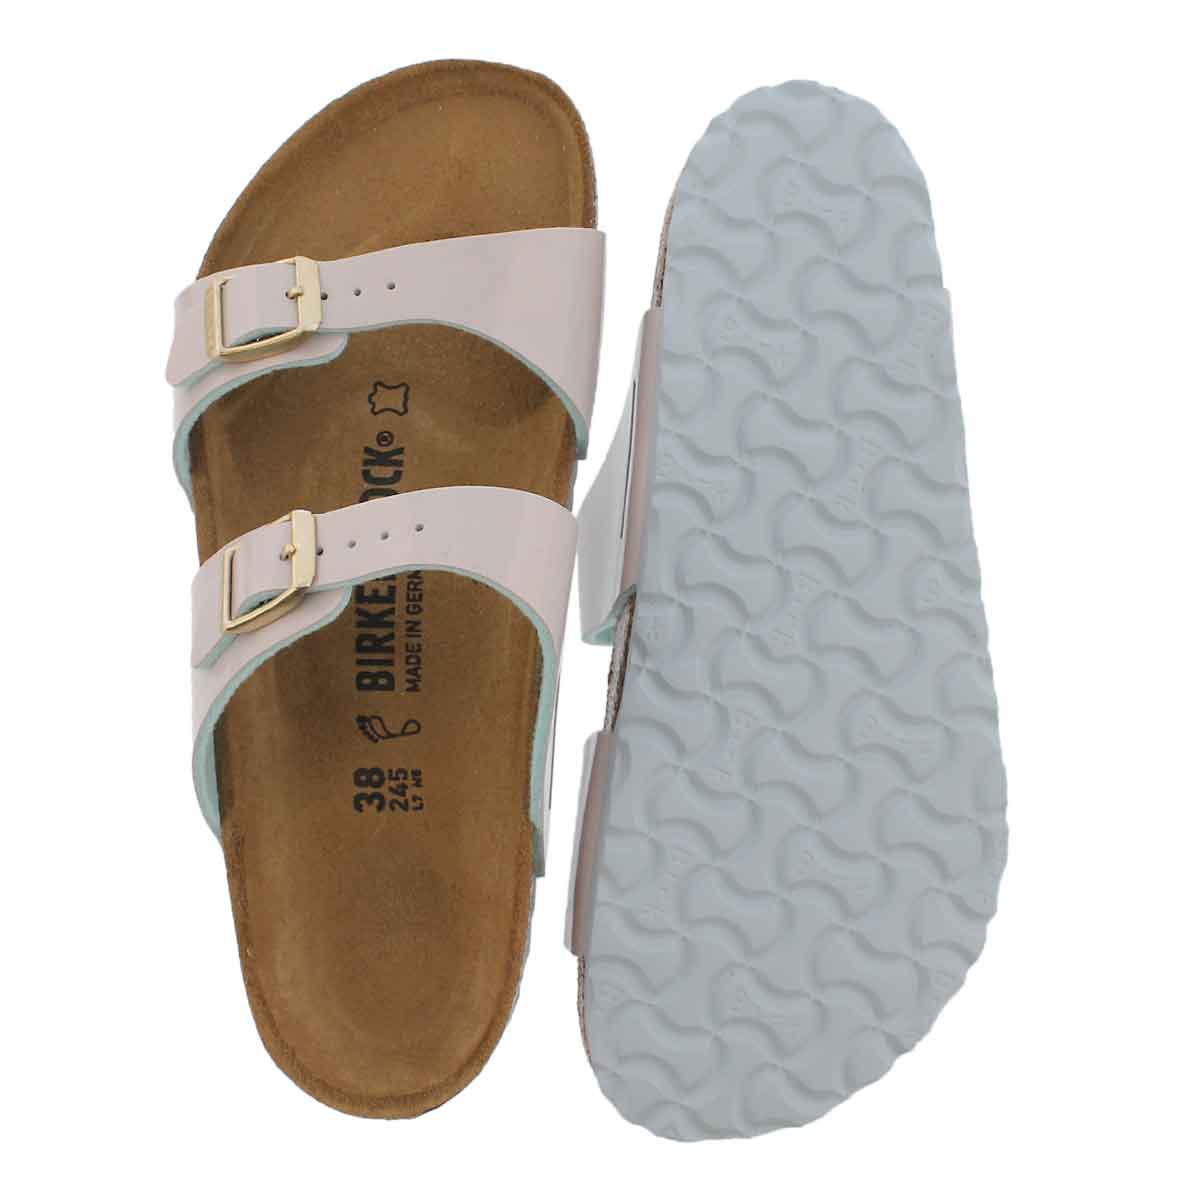 LdsSydney BF two tne lght gry pat sandal